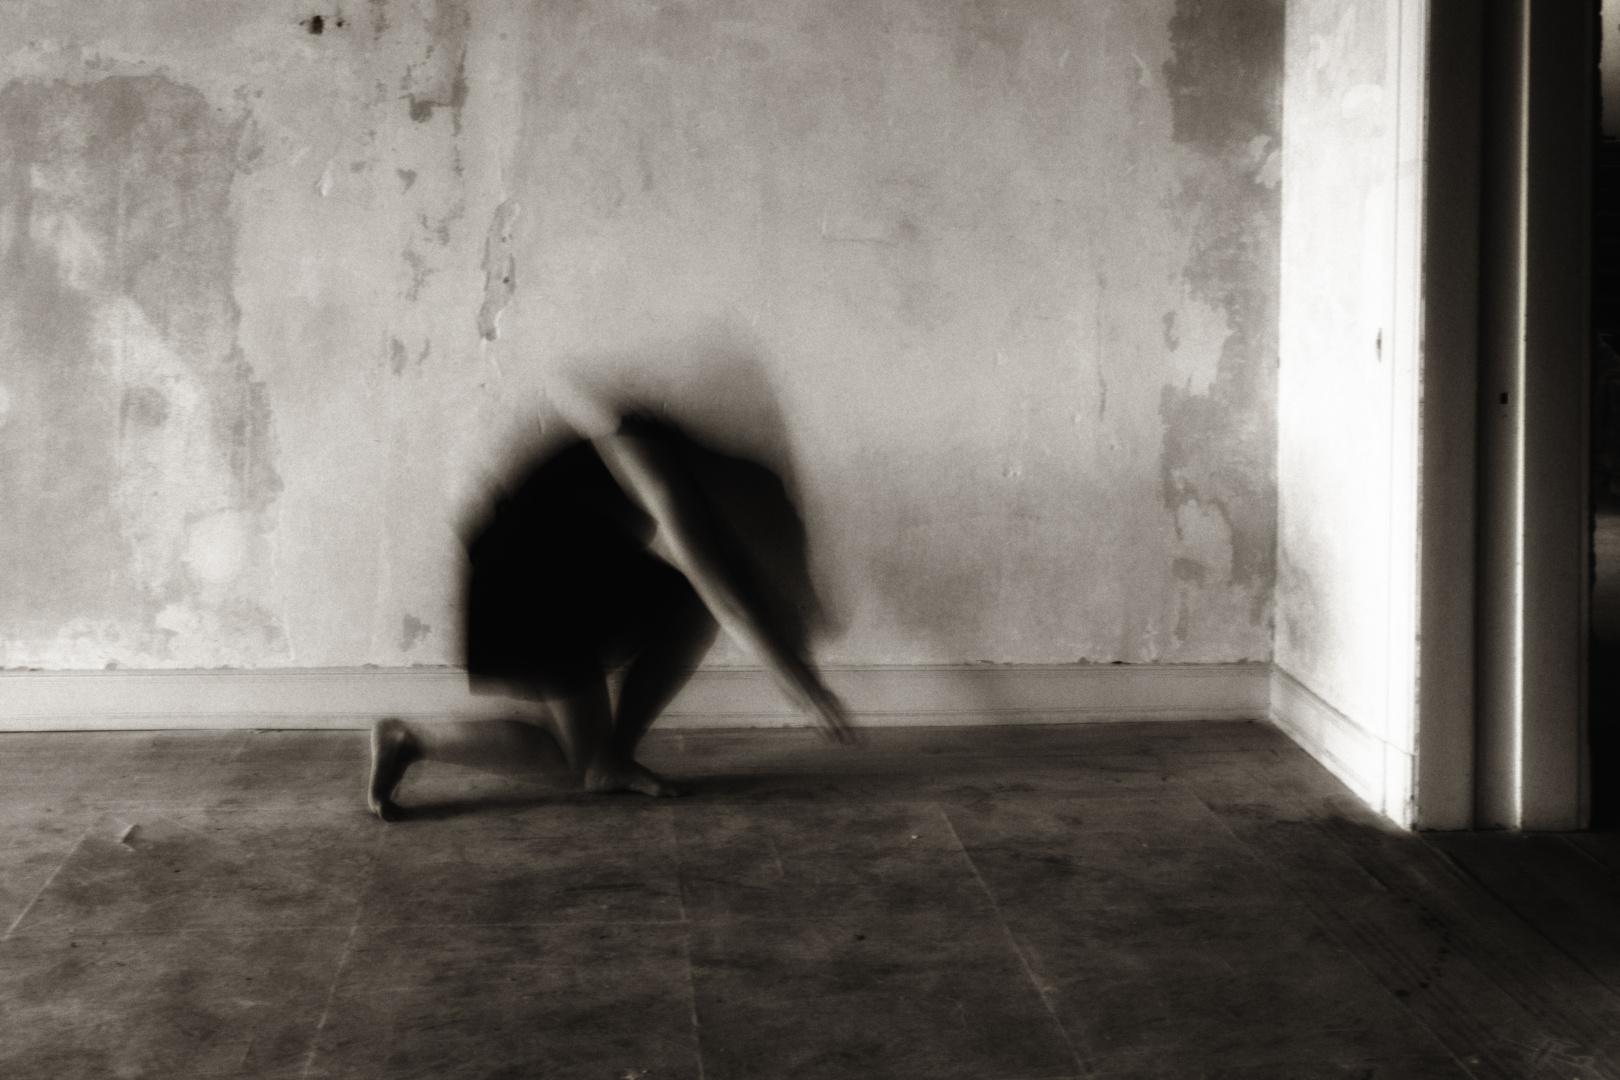 Bewegung der einsamen Frau